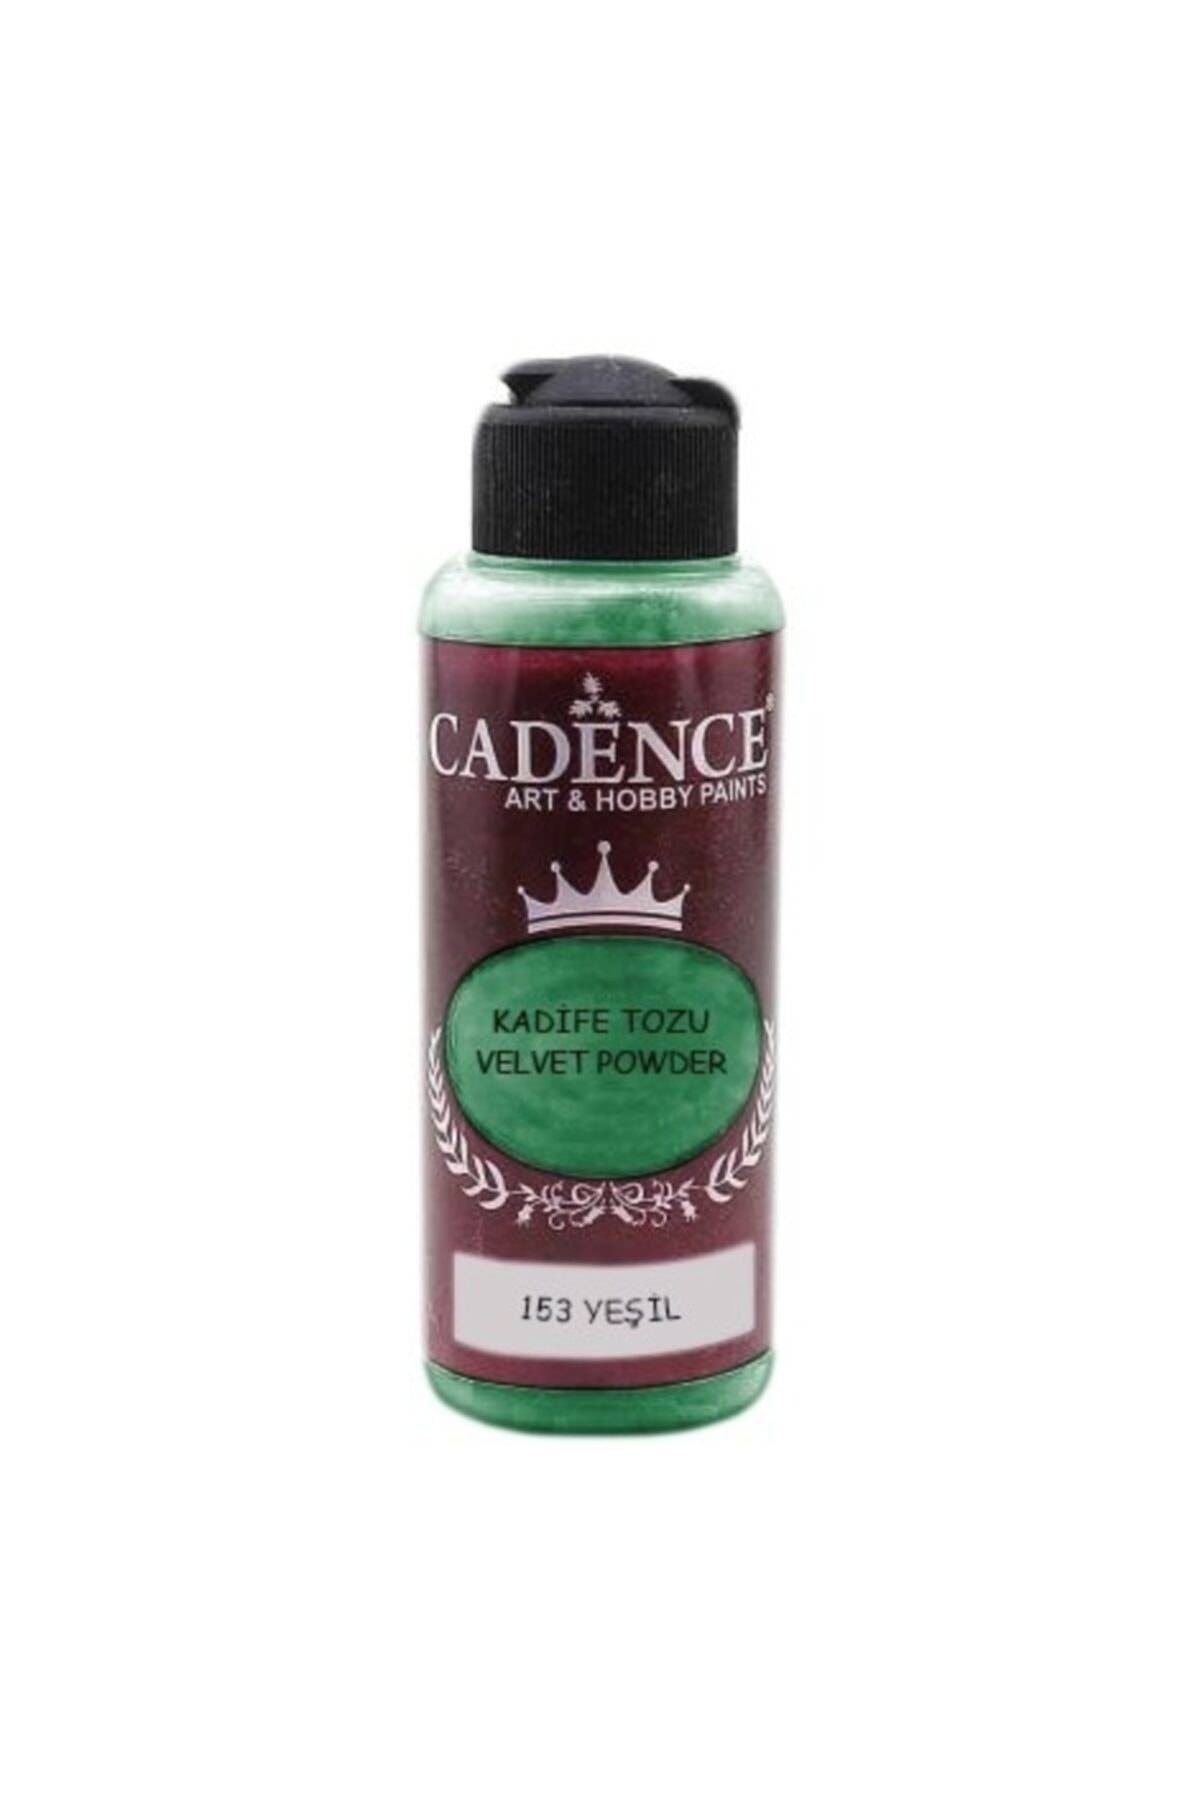 Cadence Kadife Tozu Yeşil 153